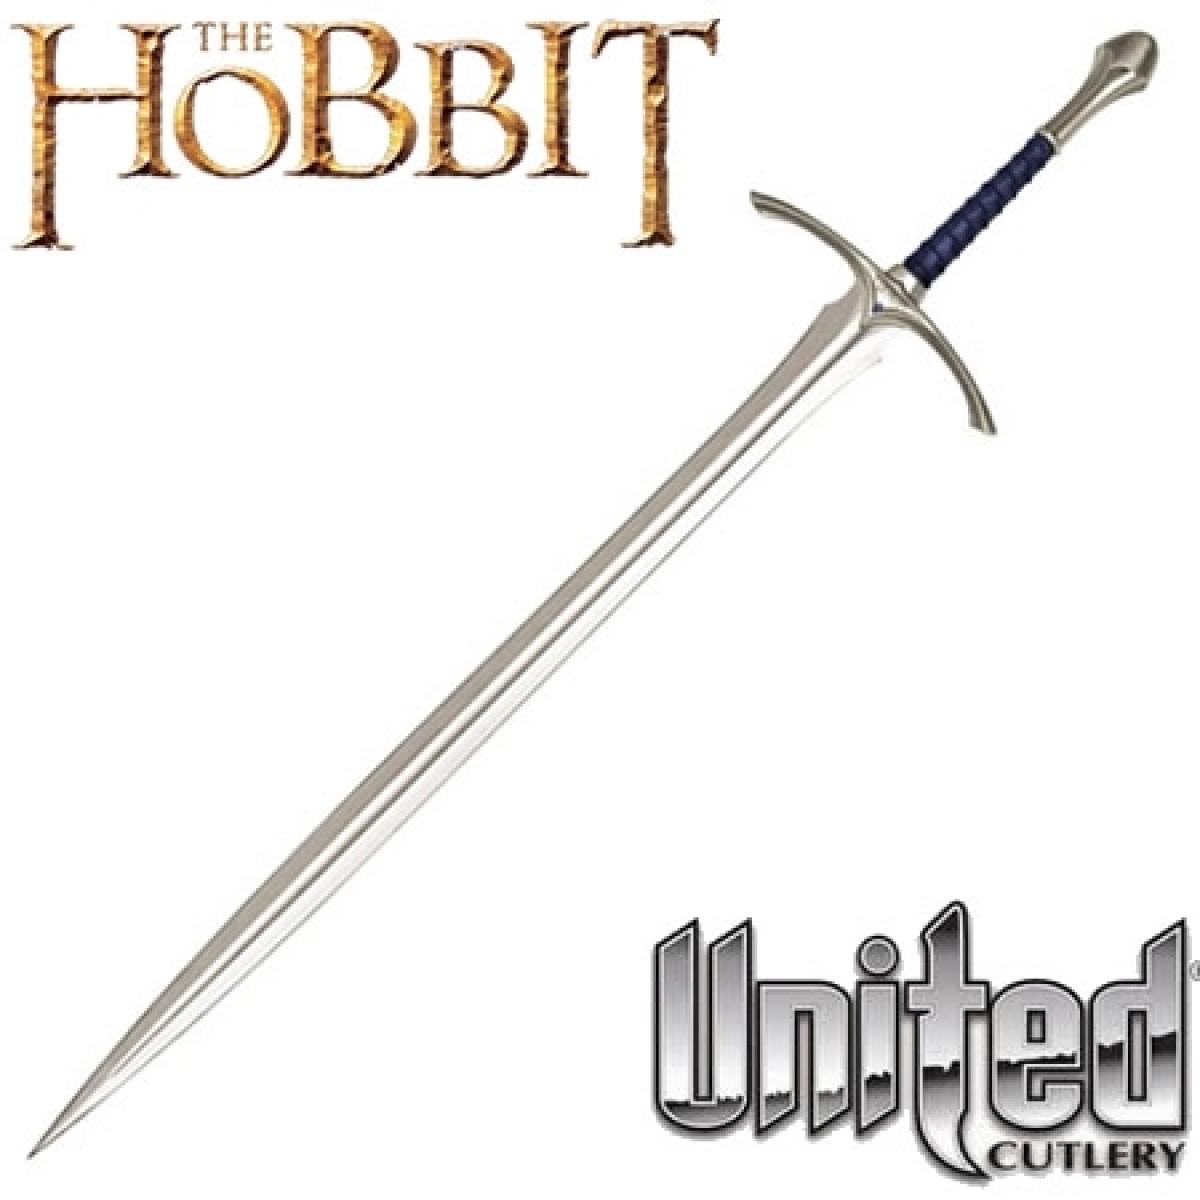 Barringtons Swords | The Hobbit Glamdring Sword of Gandalf